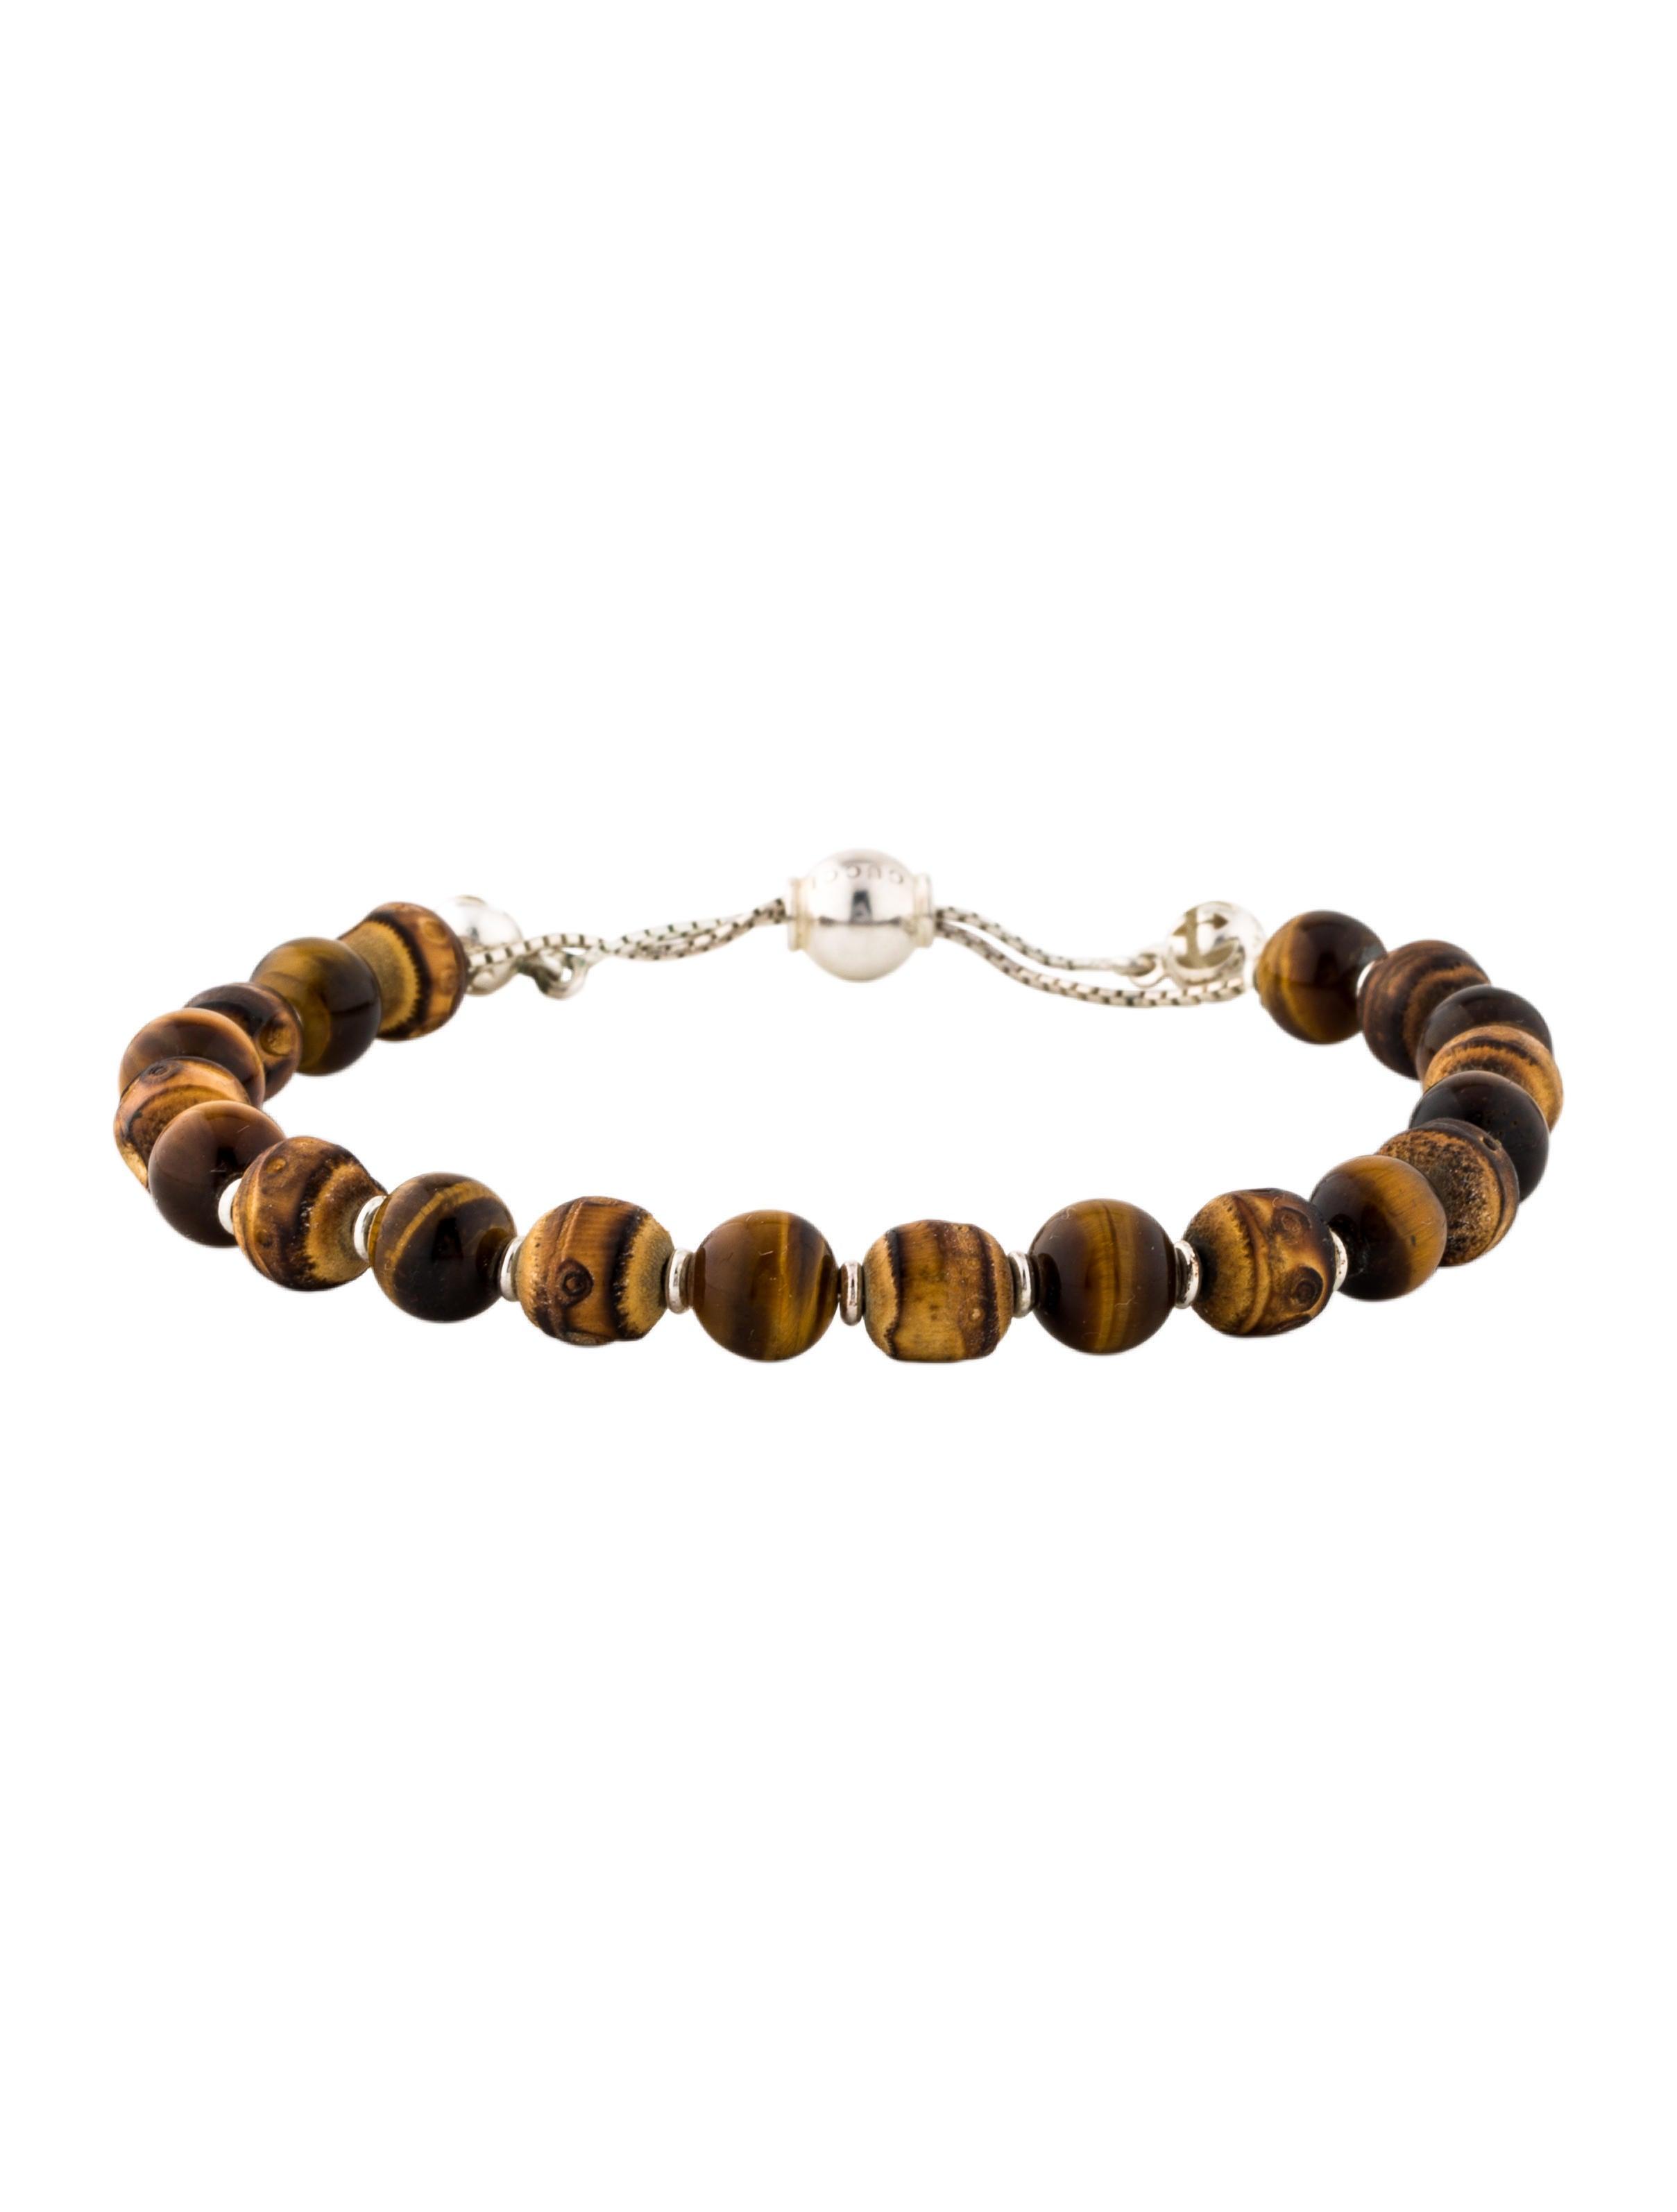 5e973b310 Gucci Boule Britt Bamboo Wood & Tiger Eye Bead Bracelet - Bracelets ...